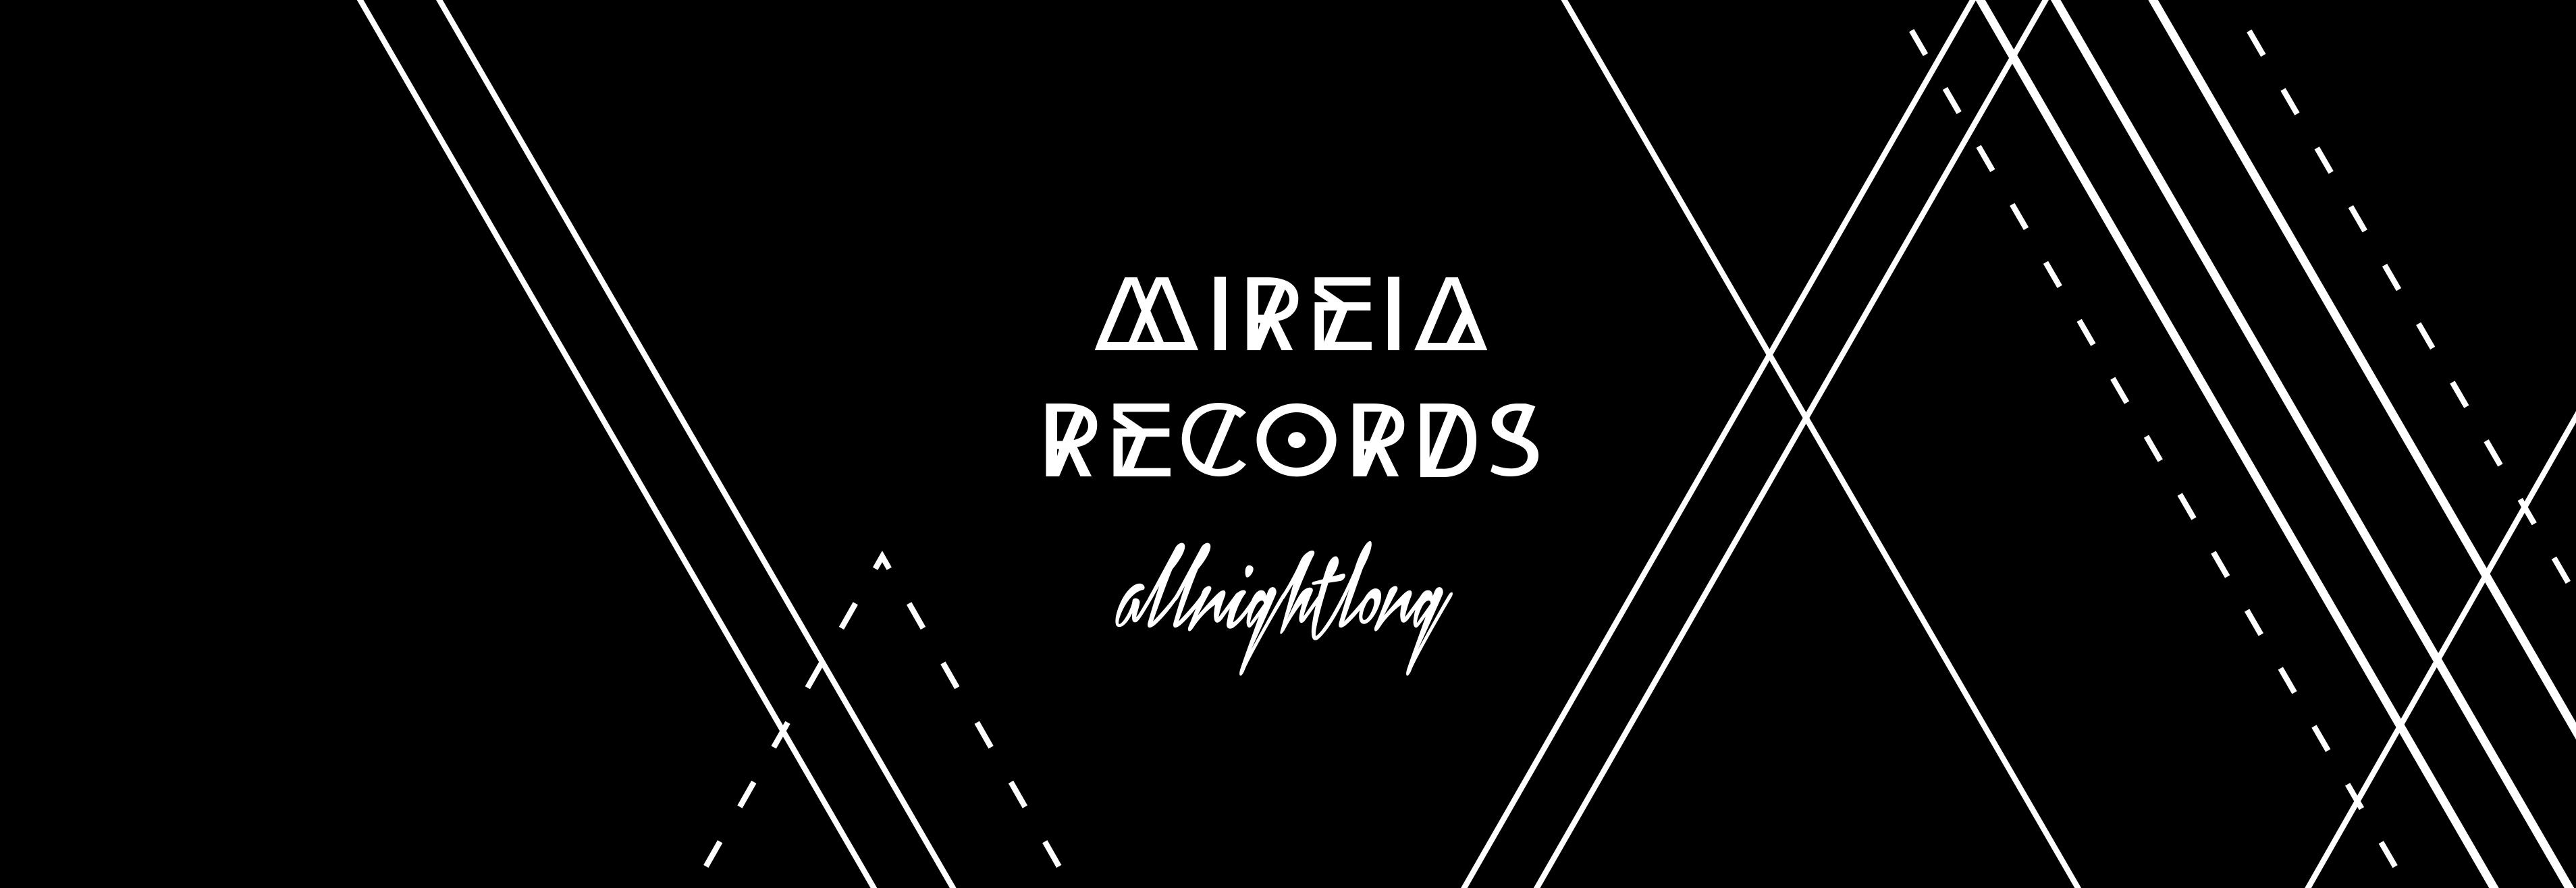 Mireia Records allnightlong || RSS Disco, Filburt, Johannes Klingebiel